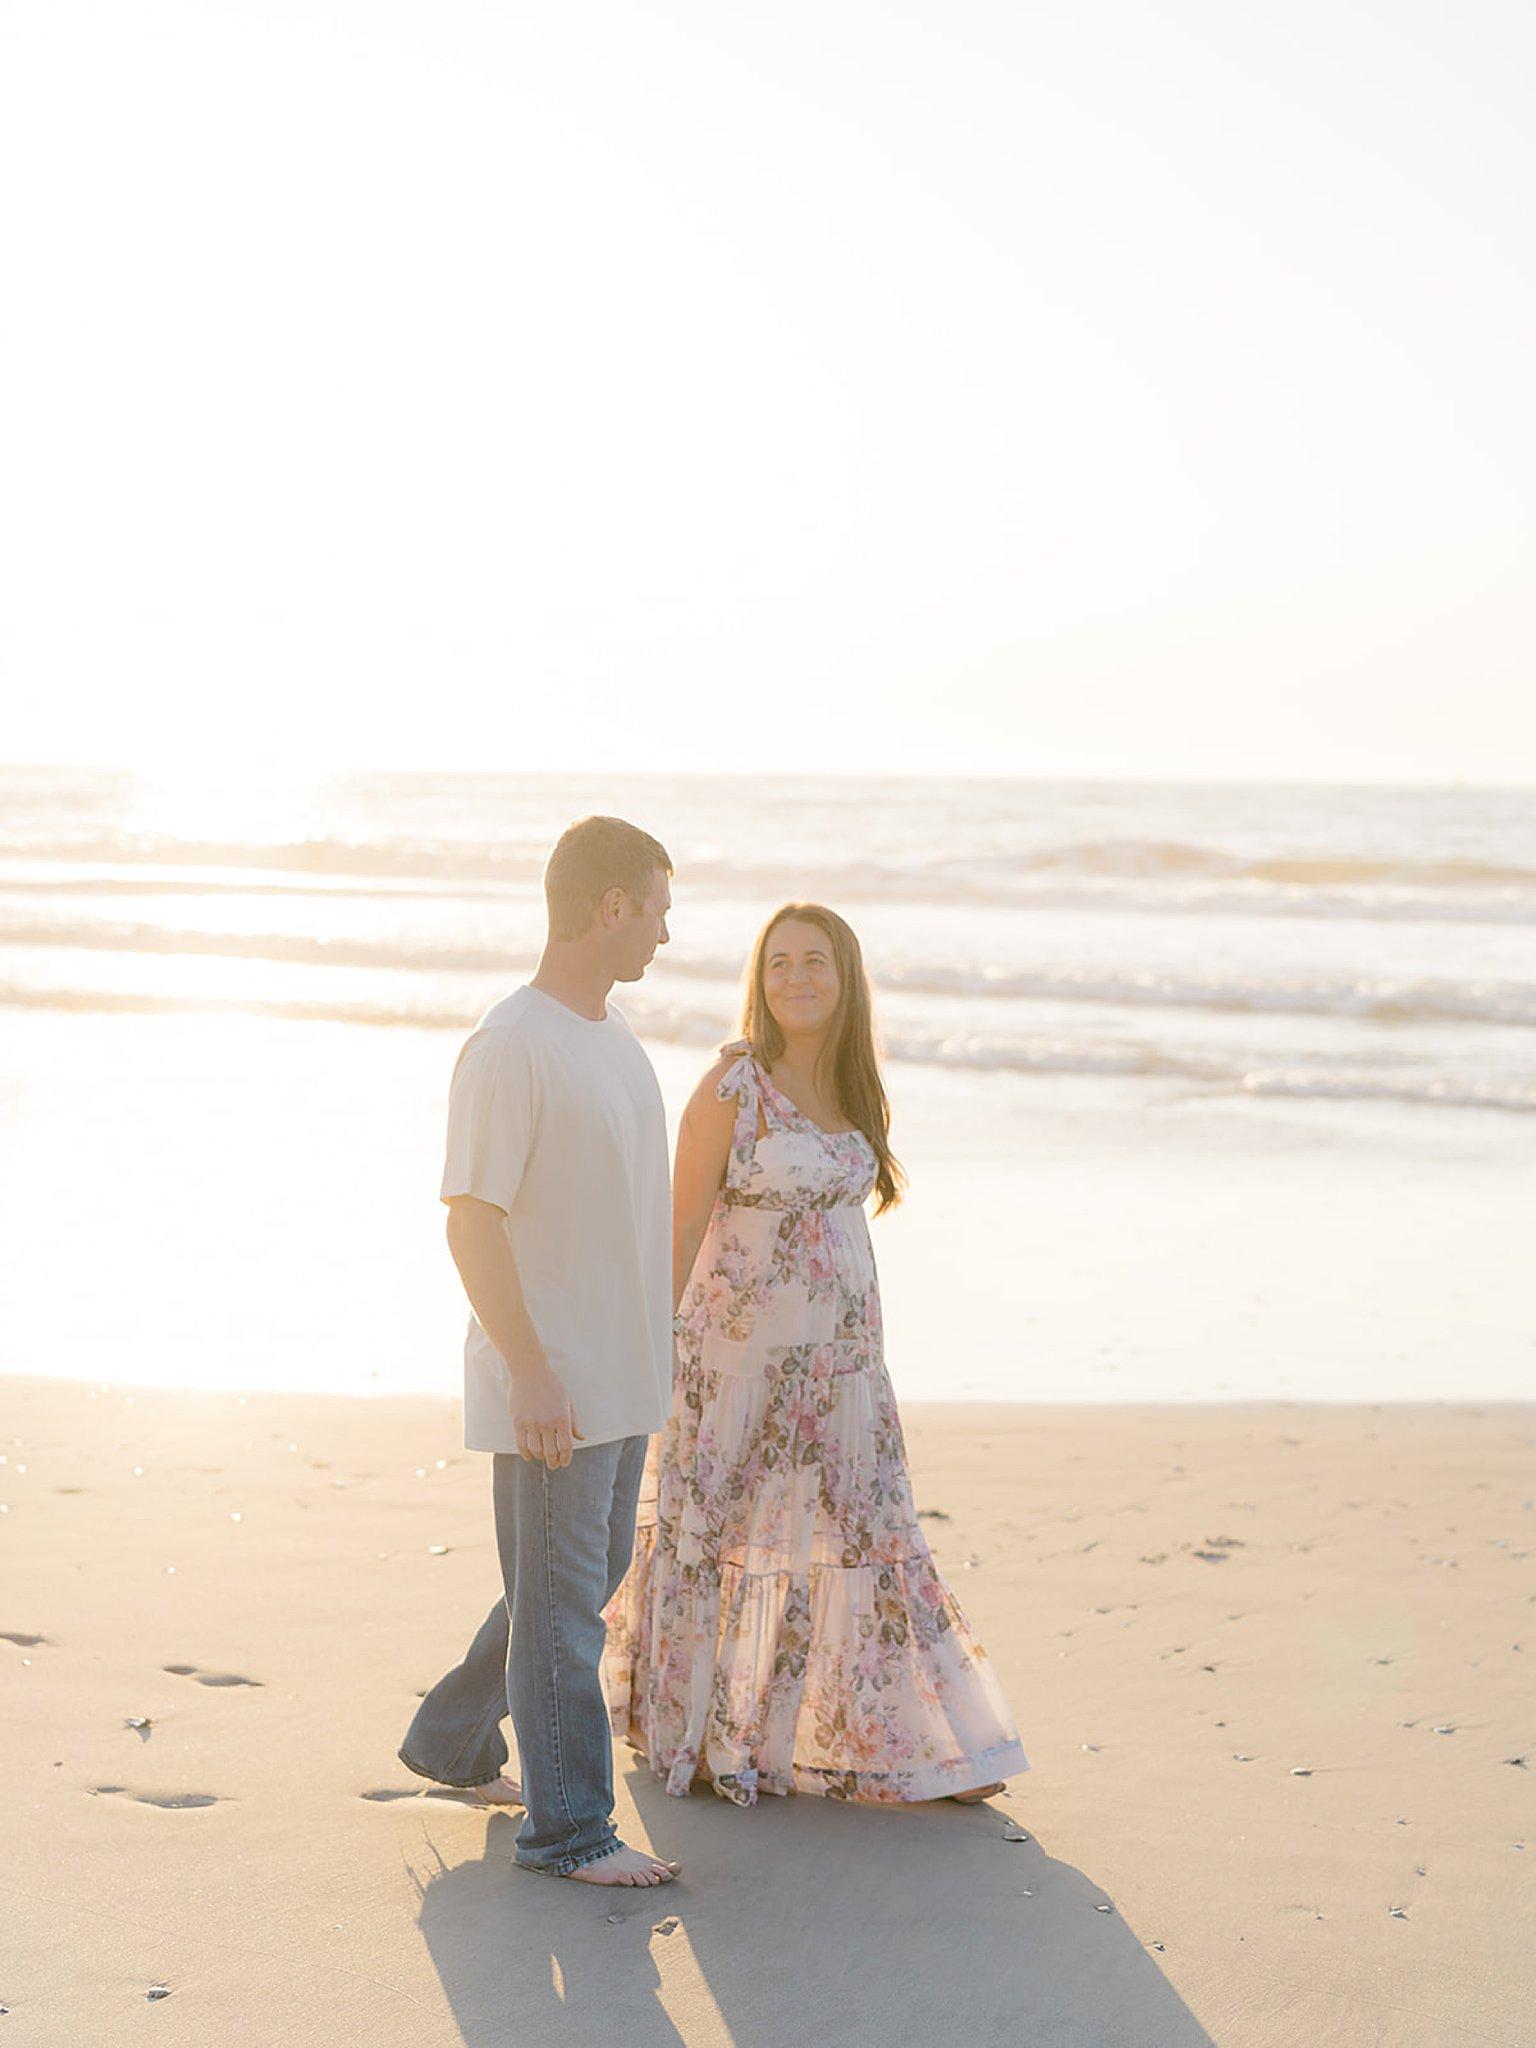 Ocean City NJ Gender Reveal Pregnancy Photography by Magdalena Studios 0016 1